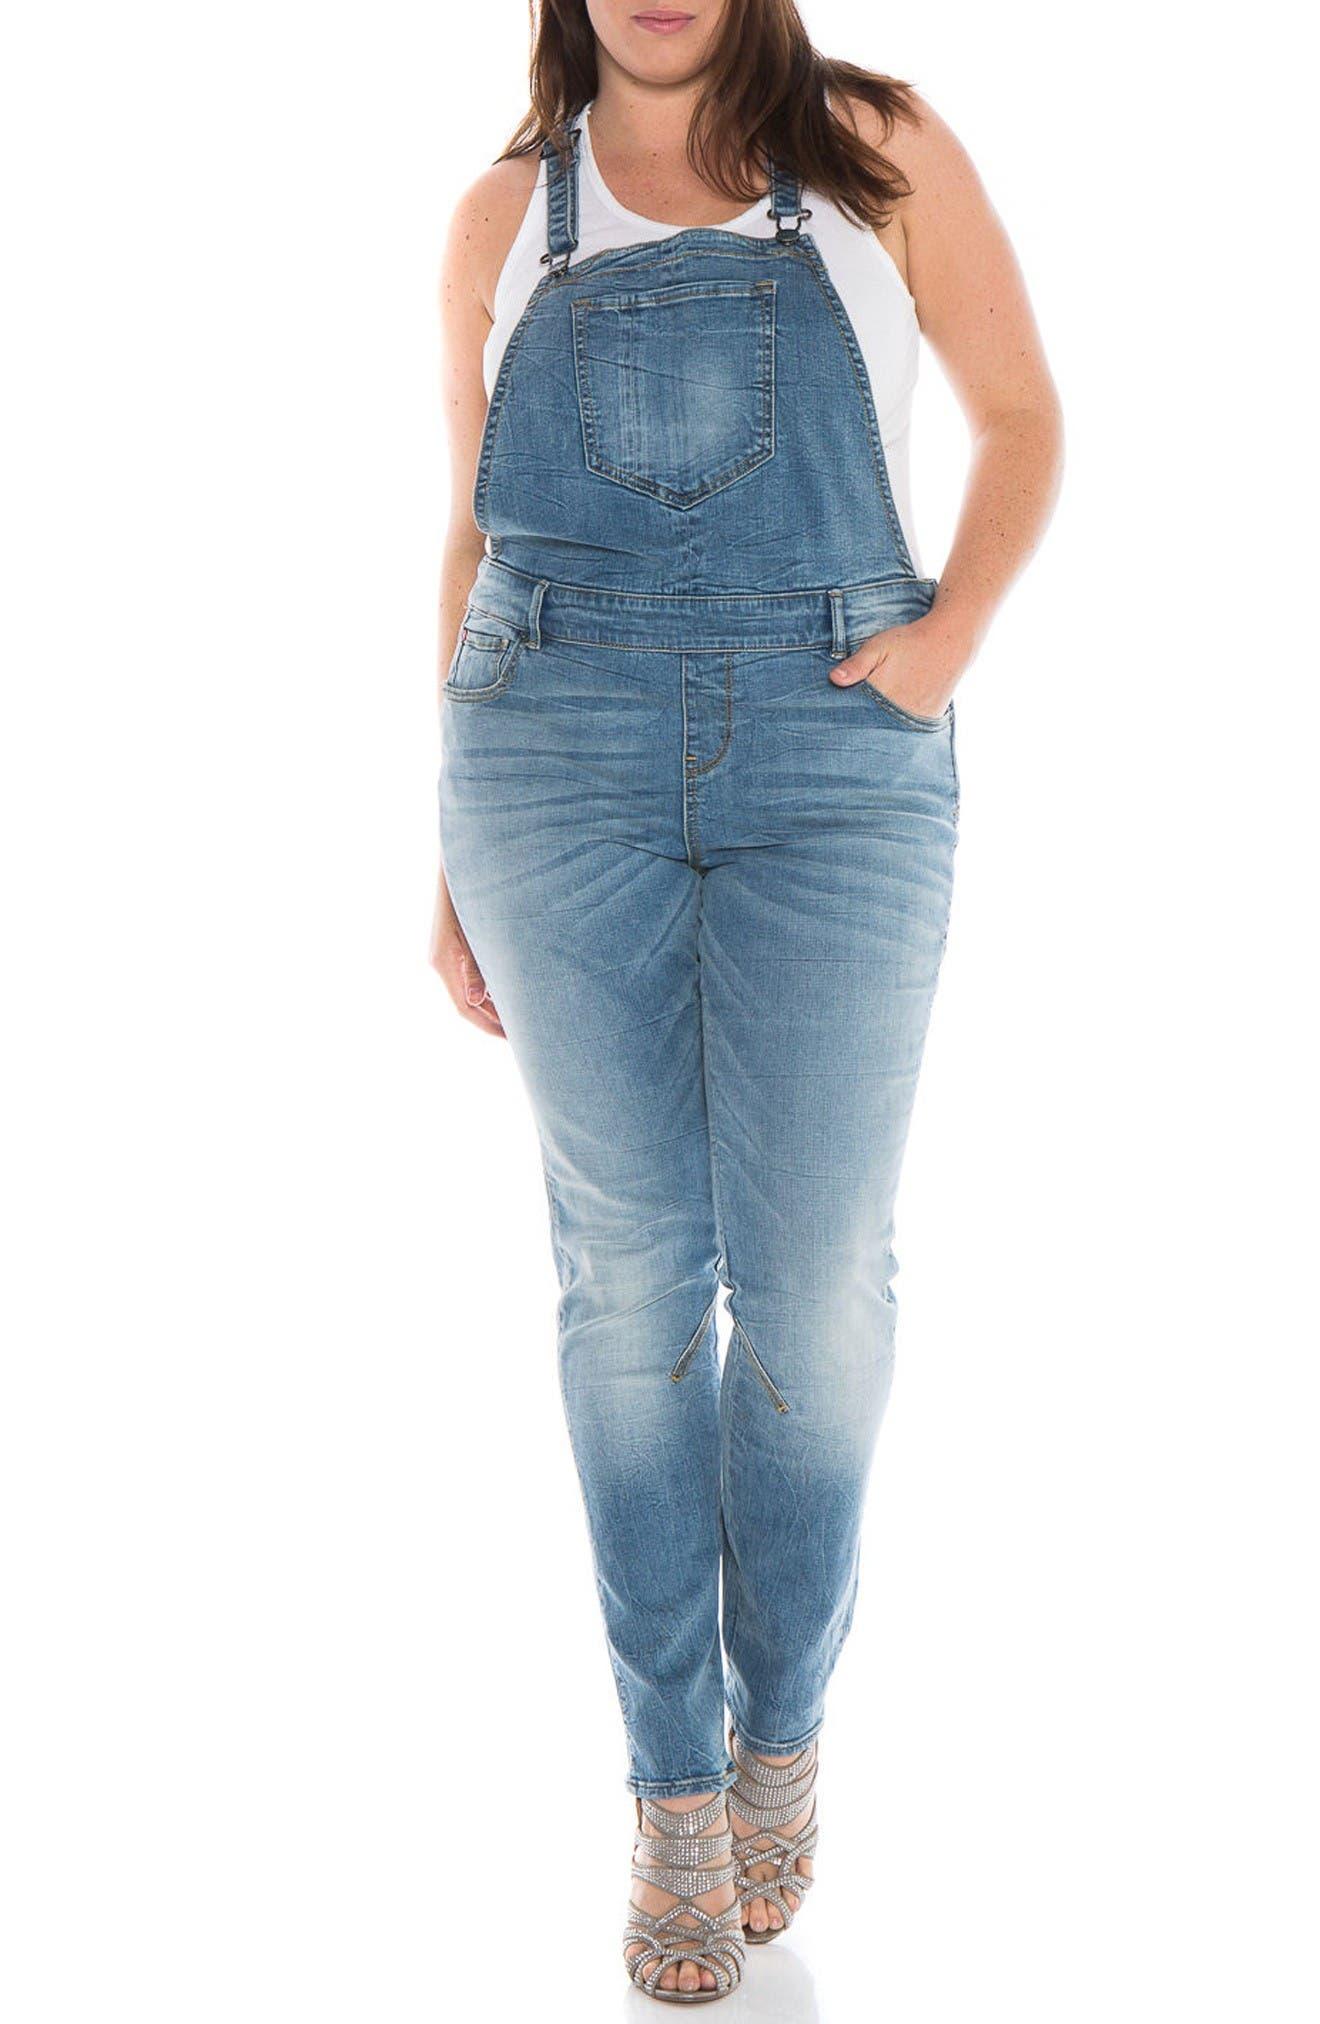 Alternate Image 1 Selected - SLINK Jeans Racerback Overalls (Anna) (Plus Size)